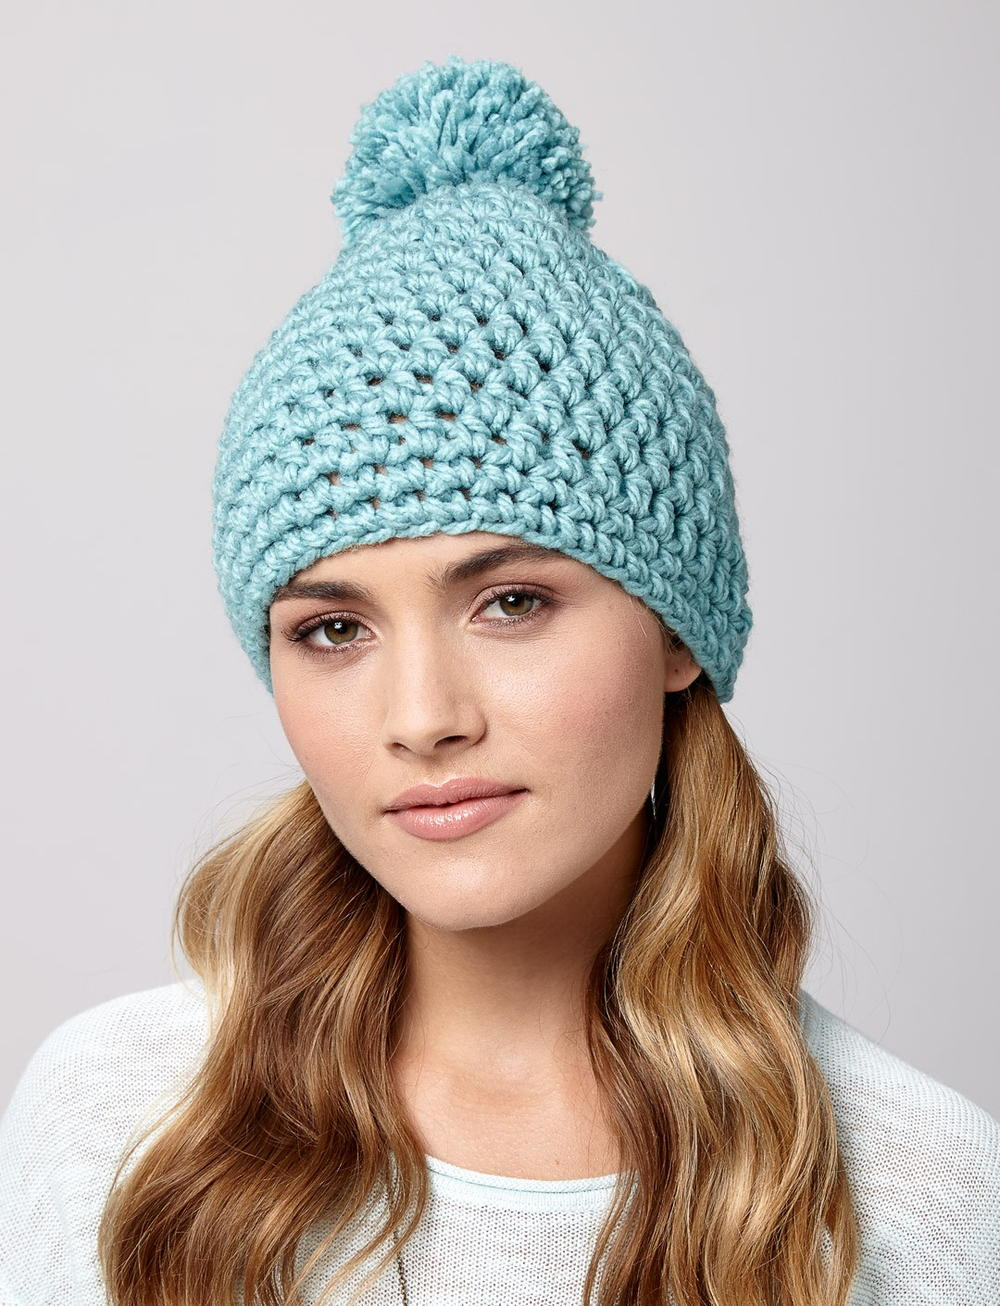 cookie monster knit hat pattern online